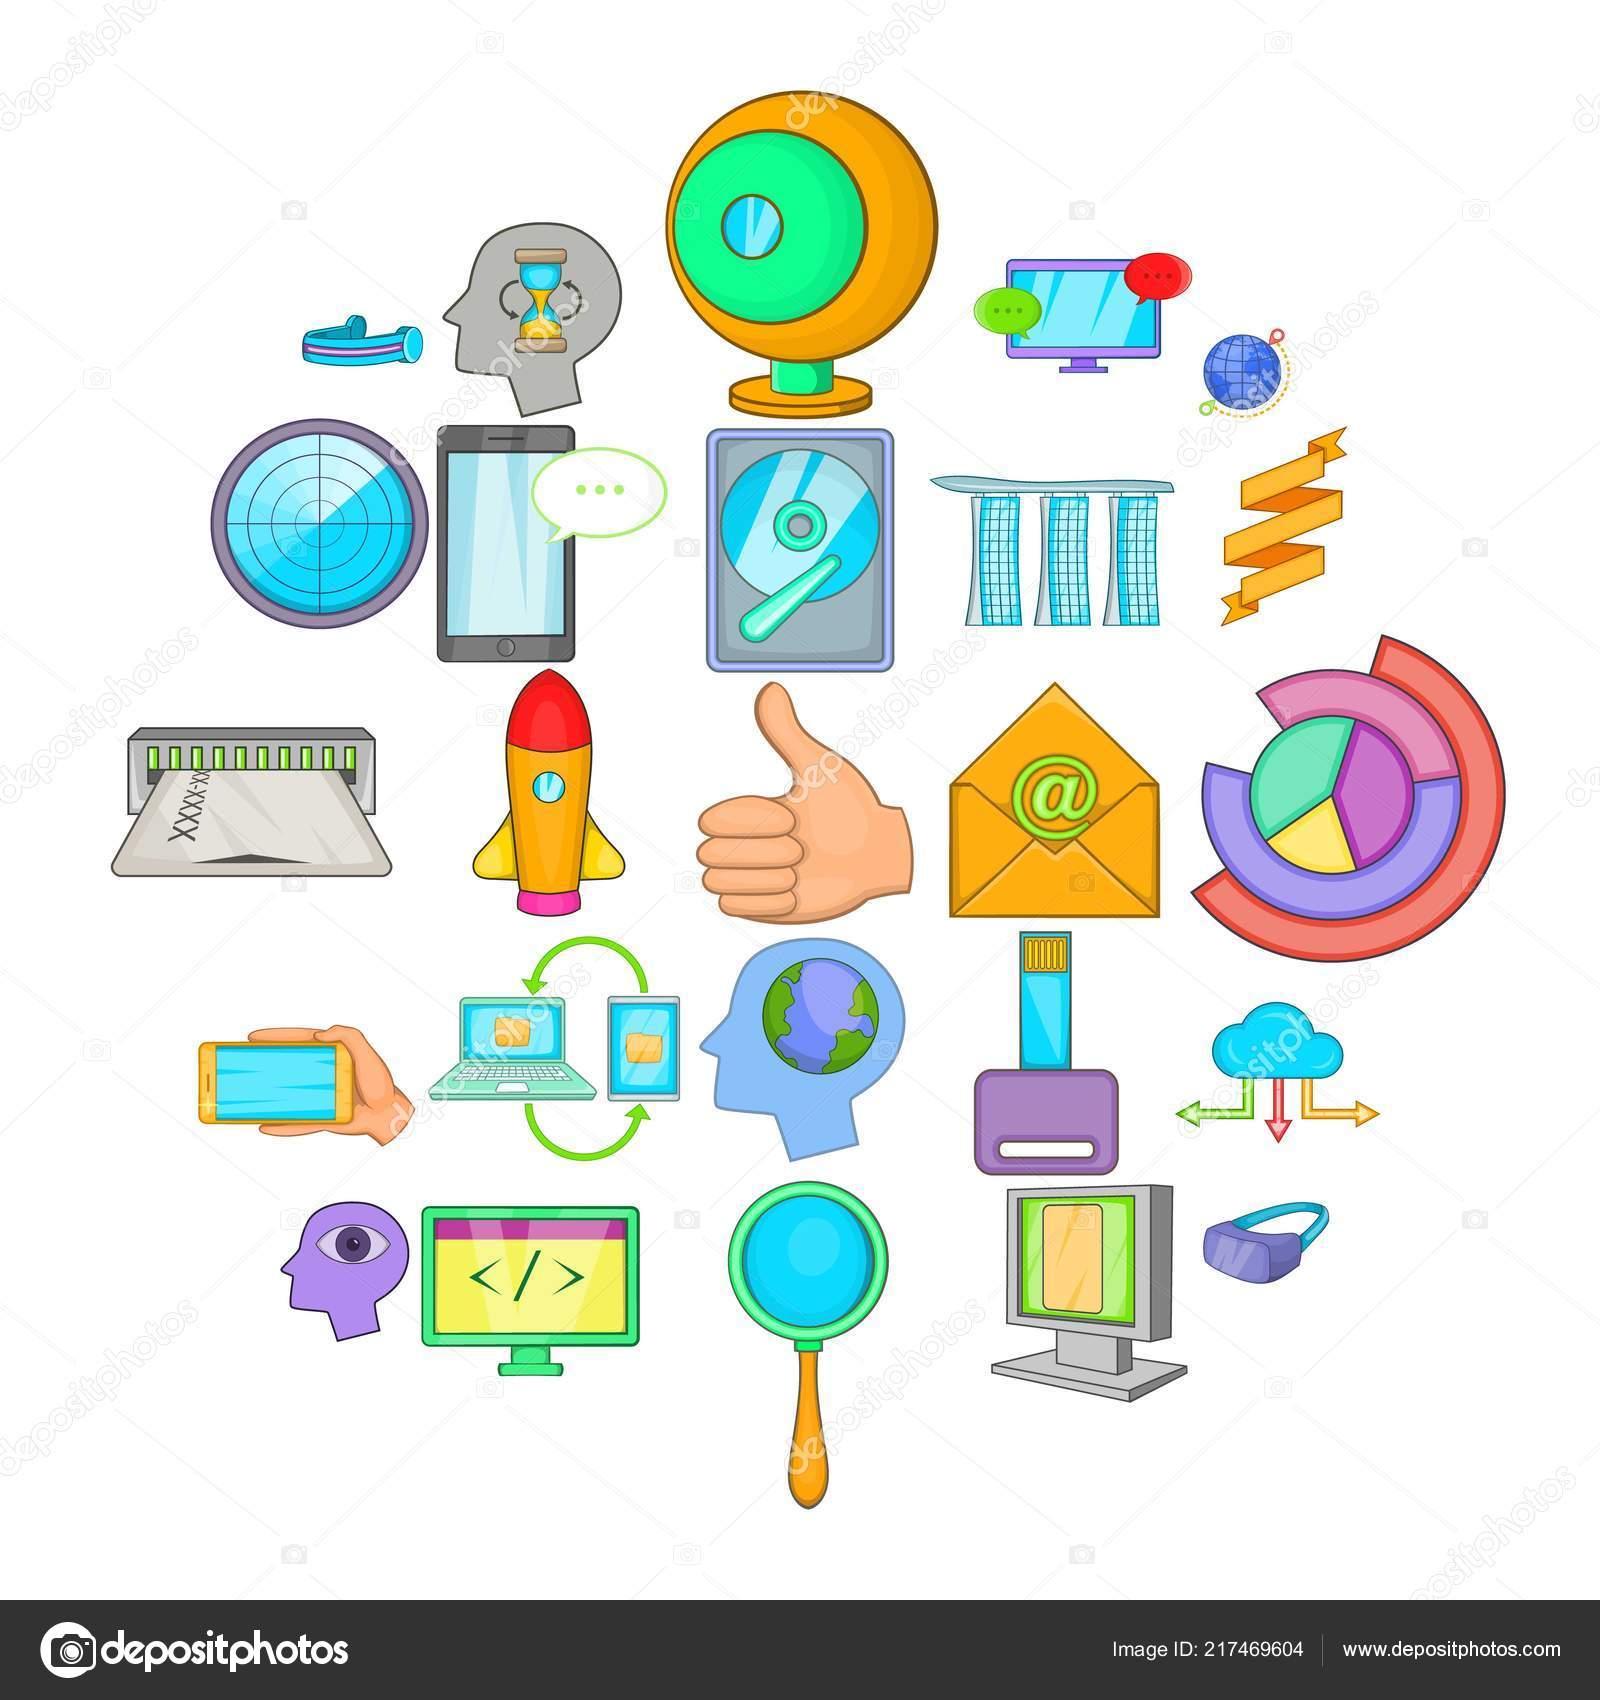 Data transfer icons set, cartoon style \u2014 Stock Vector